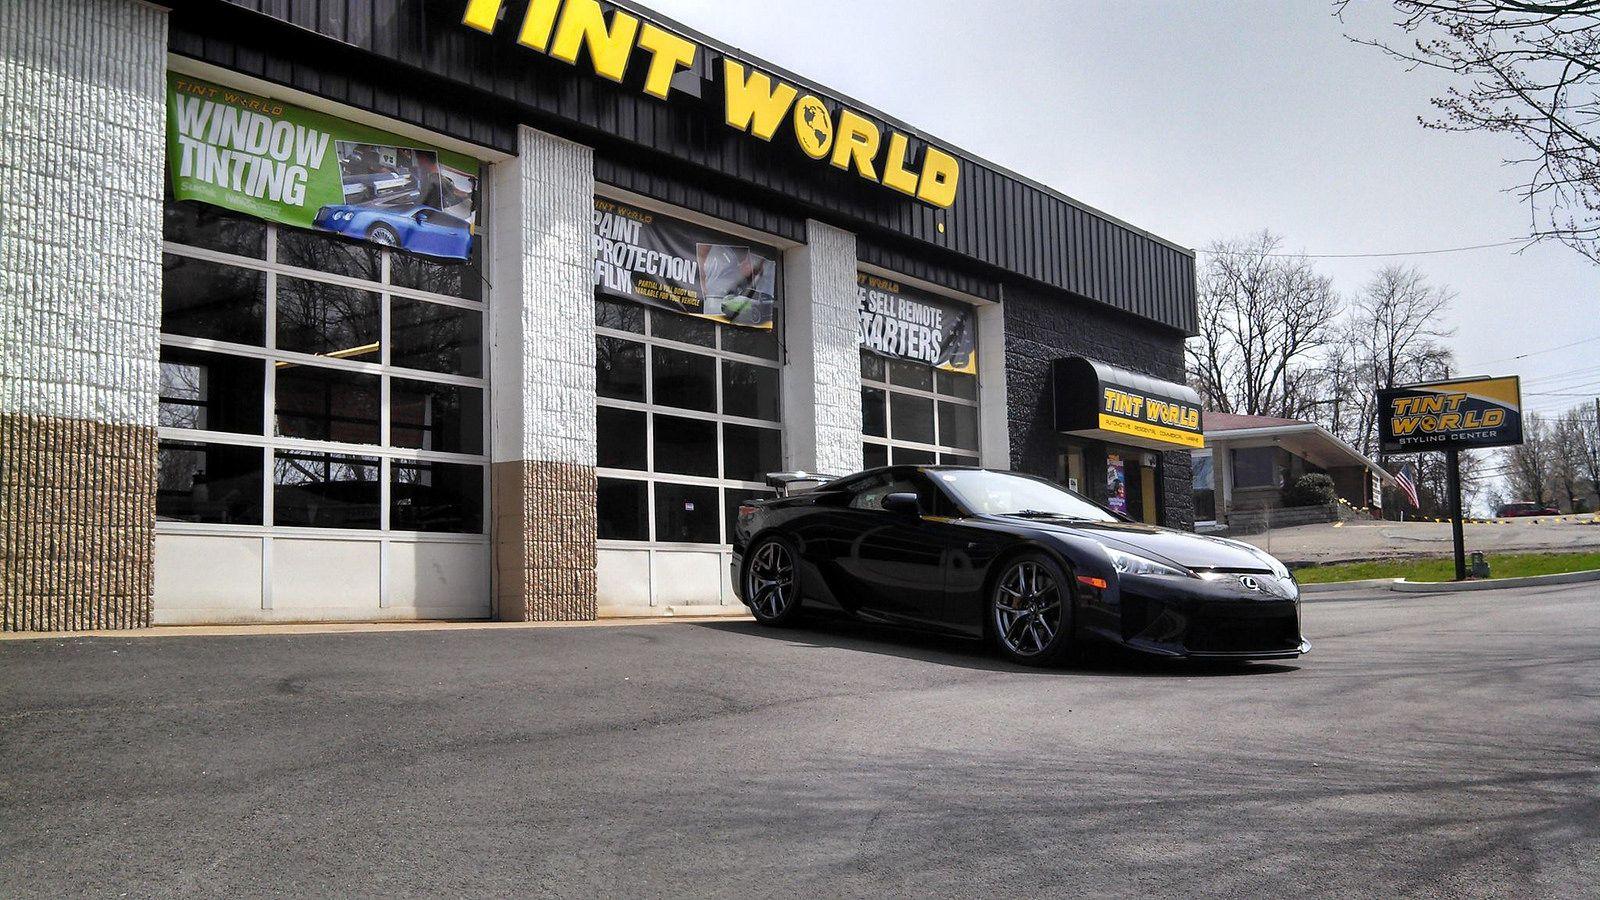 Tint World Penn Hills, PA